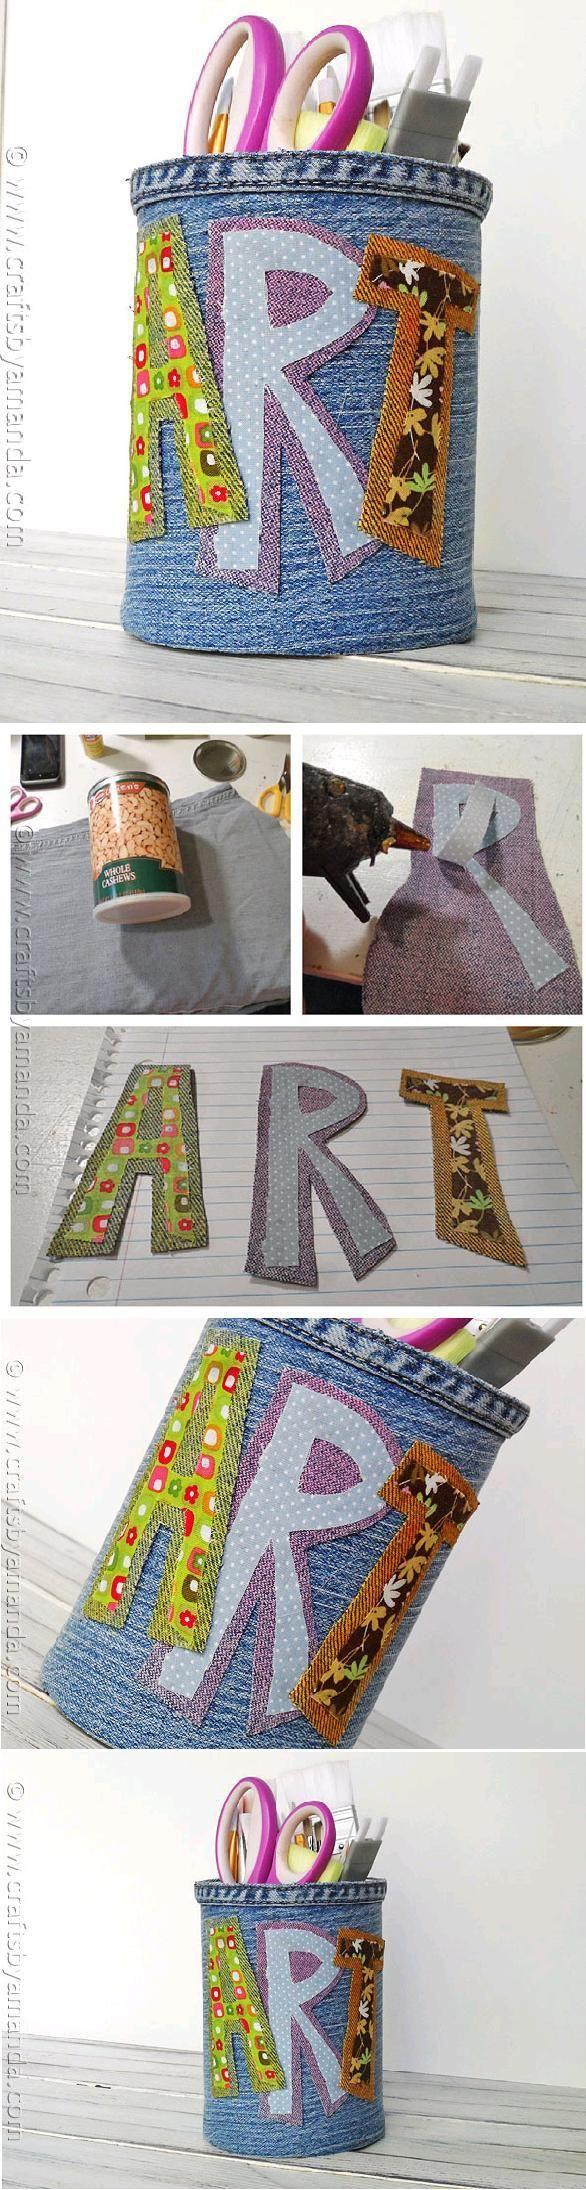 DIY Tutorial: Diy back to school / DIY Denim Pencil Holder